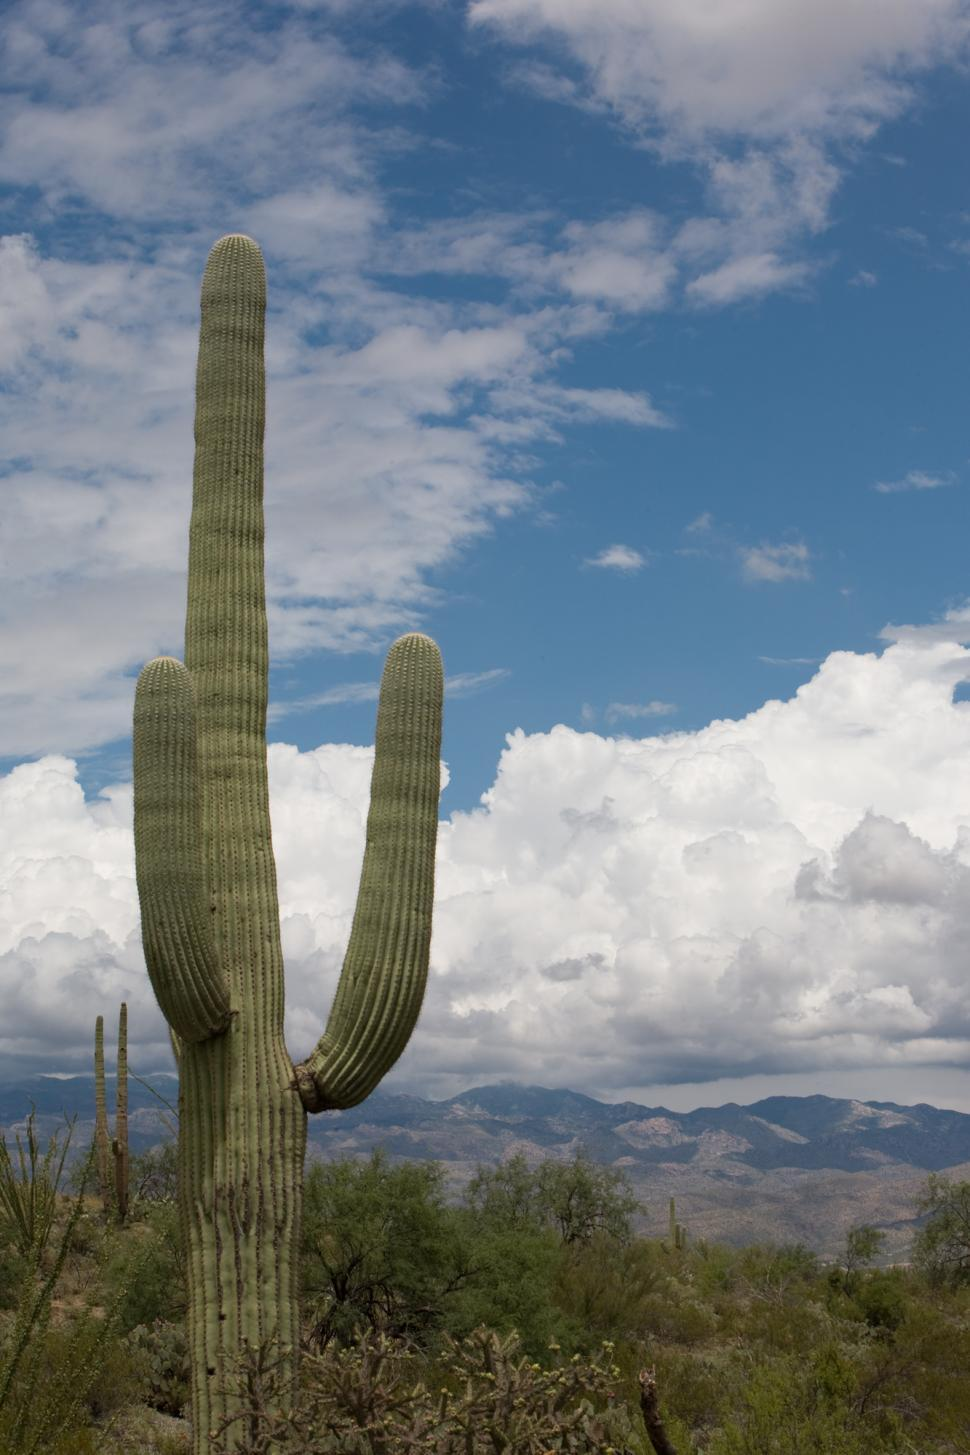 Download Free Stock HD Photo of Saguaro Cactus Online